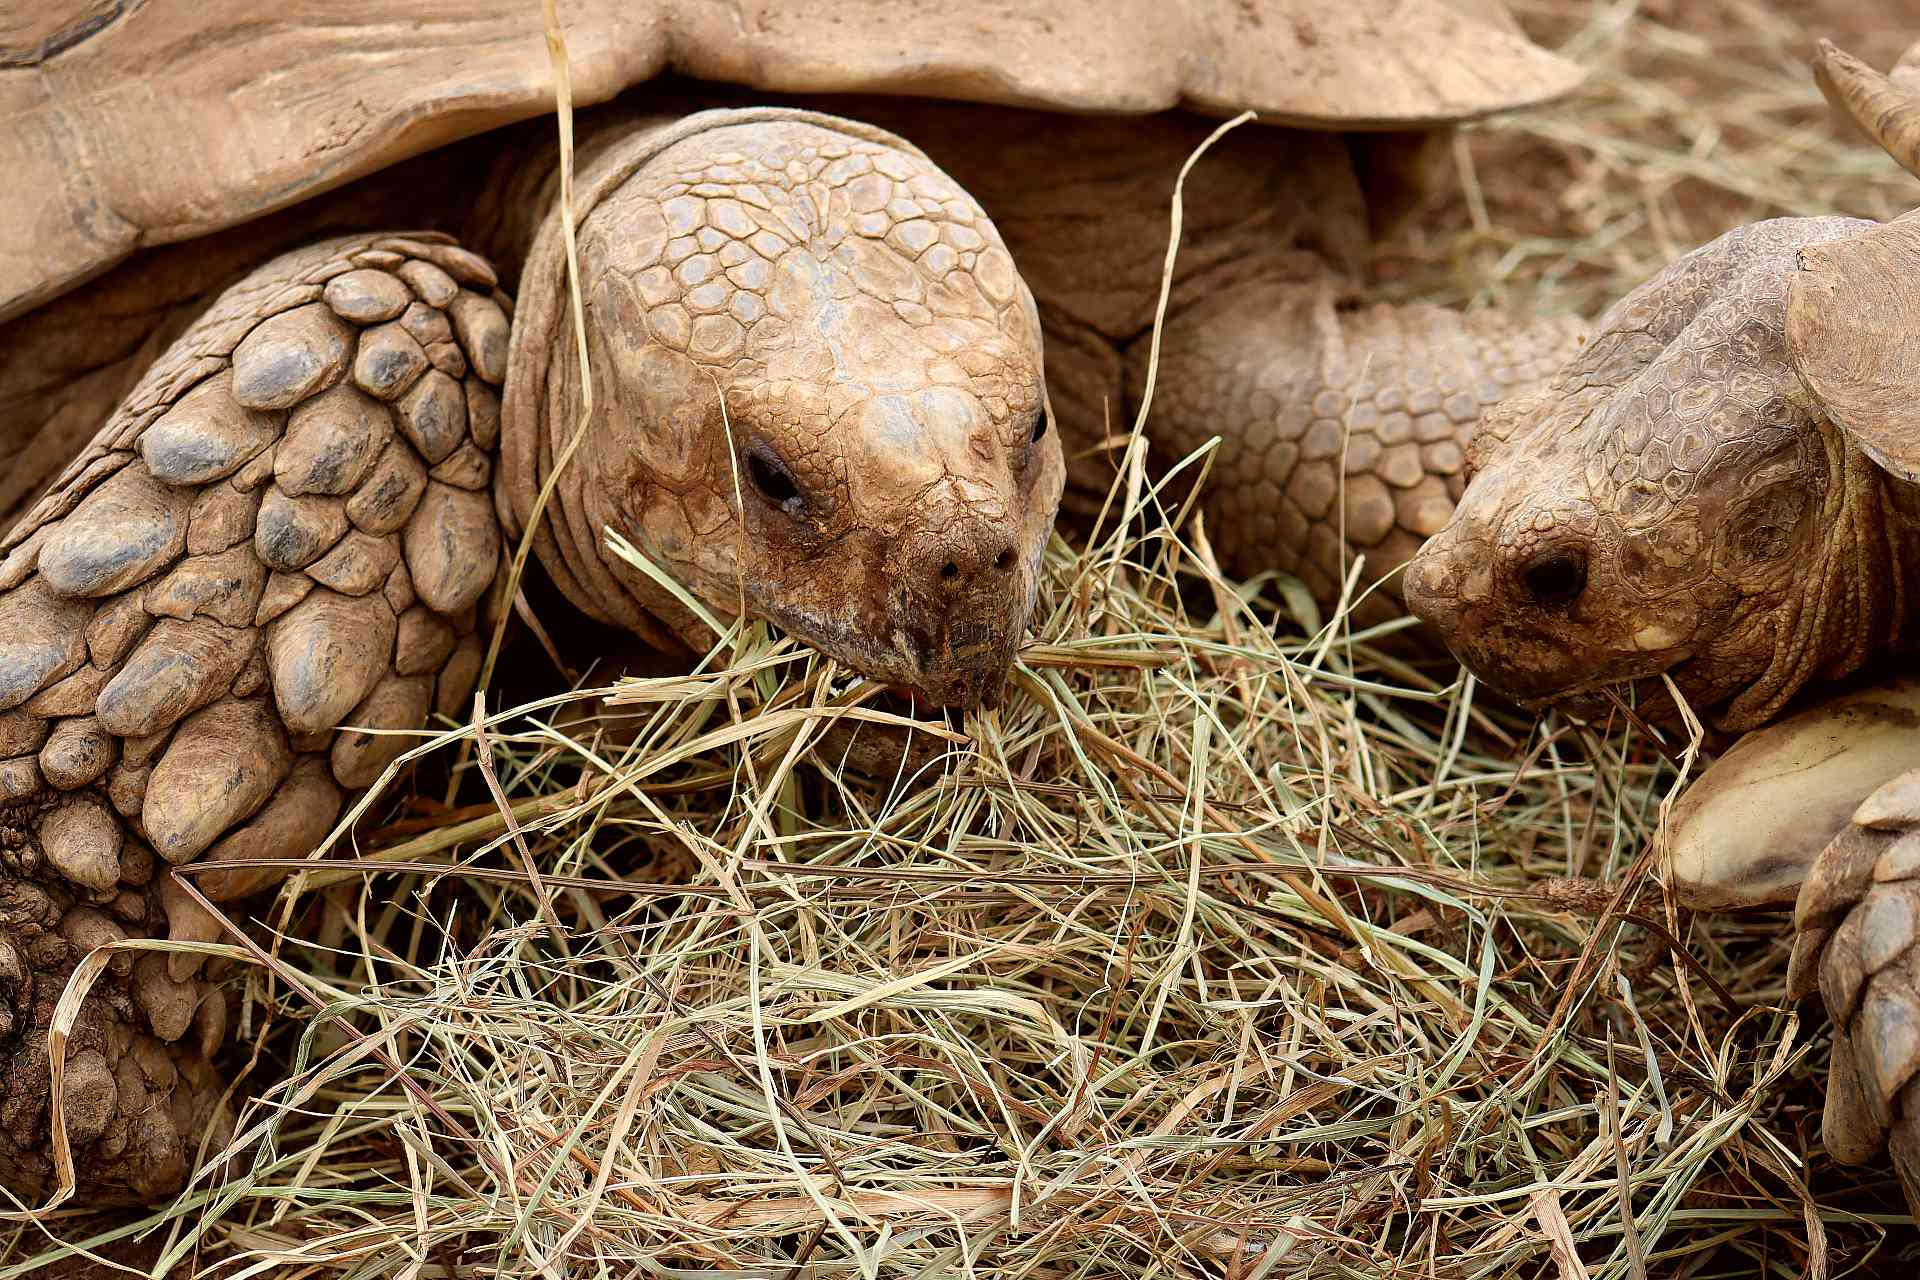 Two sulcata tortoises eating straw hay closeup